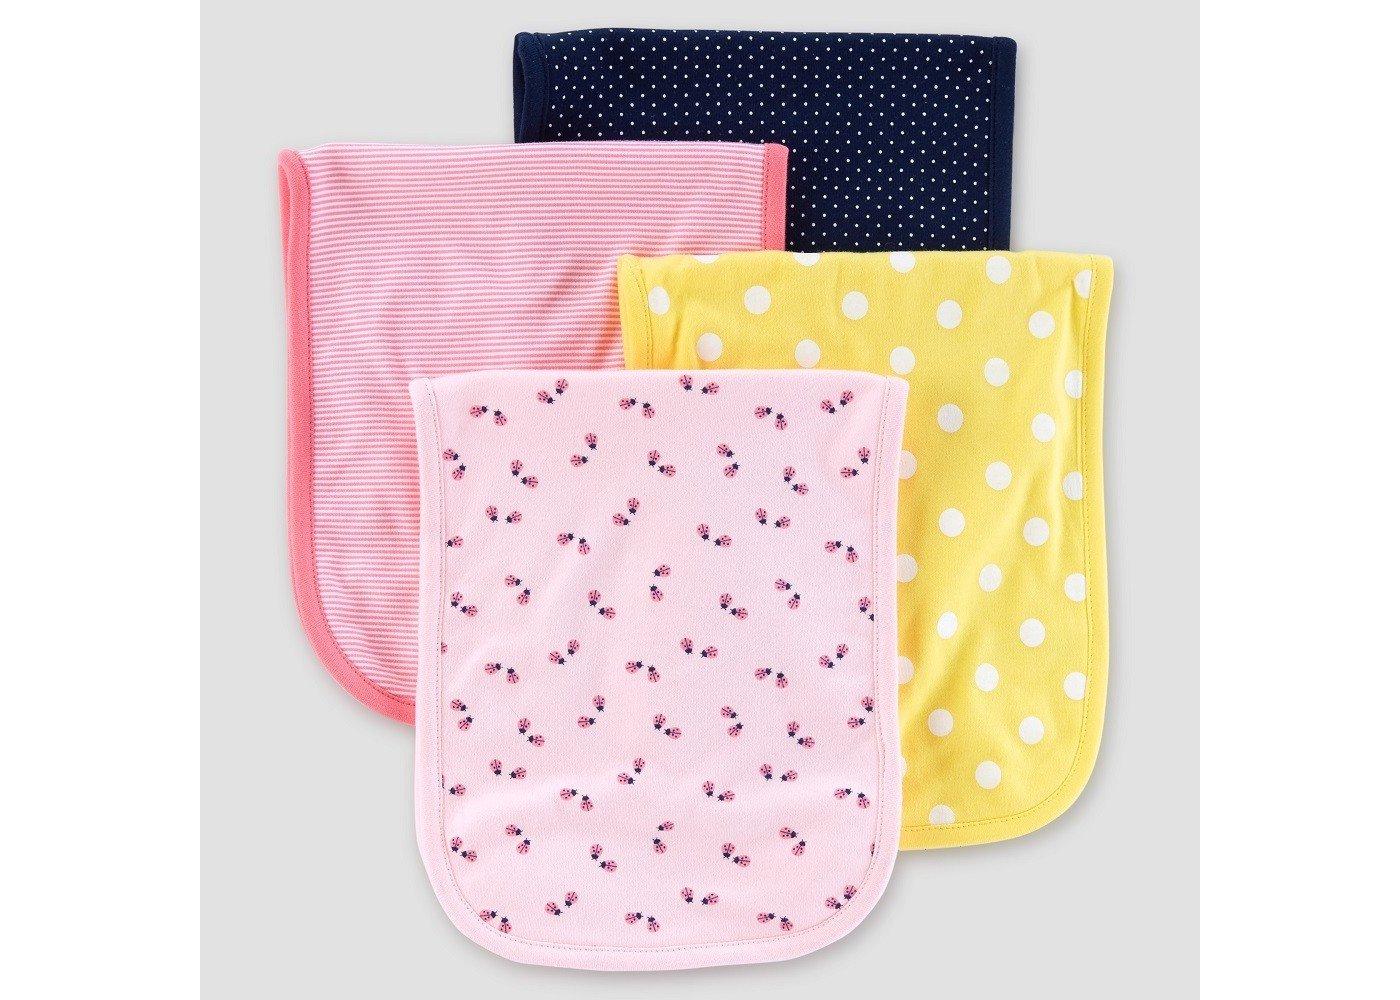 Carter's Baby Girls' 4-Pack Burp Cloths, Pink/Yellow/Navy